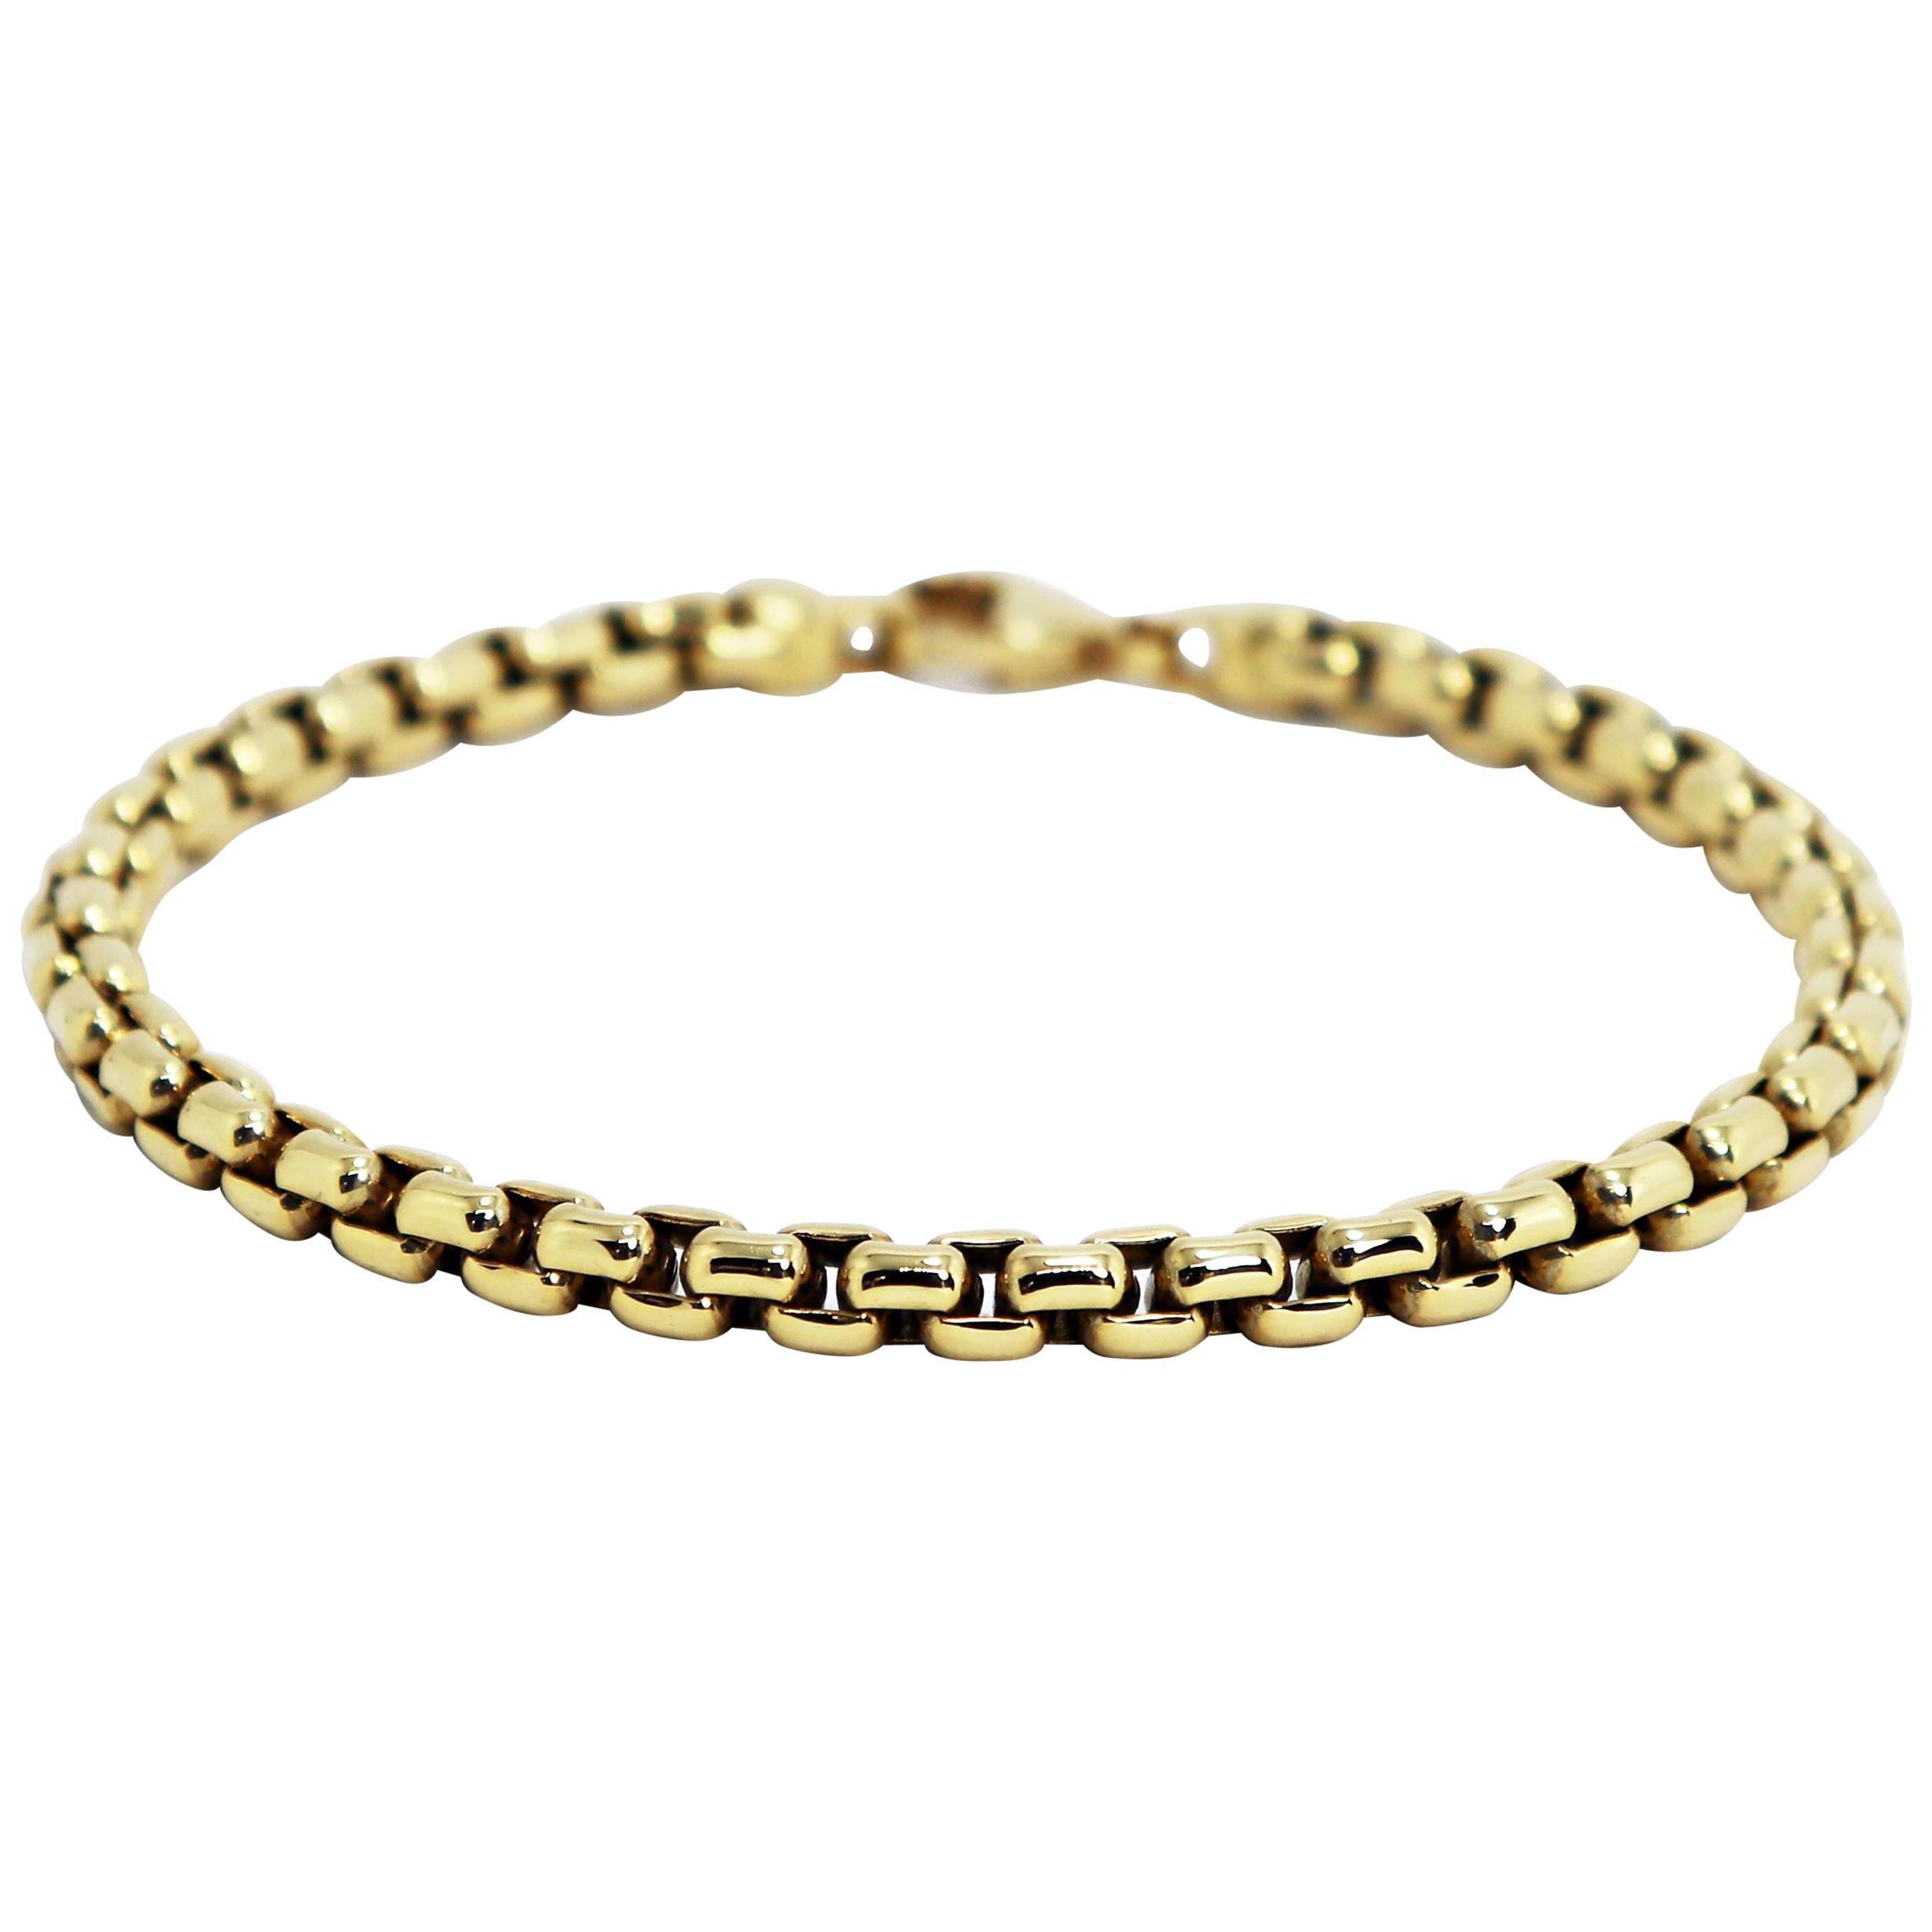 3c3b4f482 Tiffany & Co. Bracelets - 266 For Sale at 1stdibs